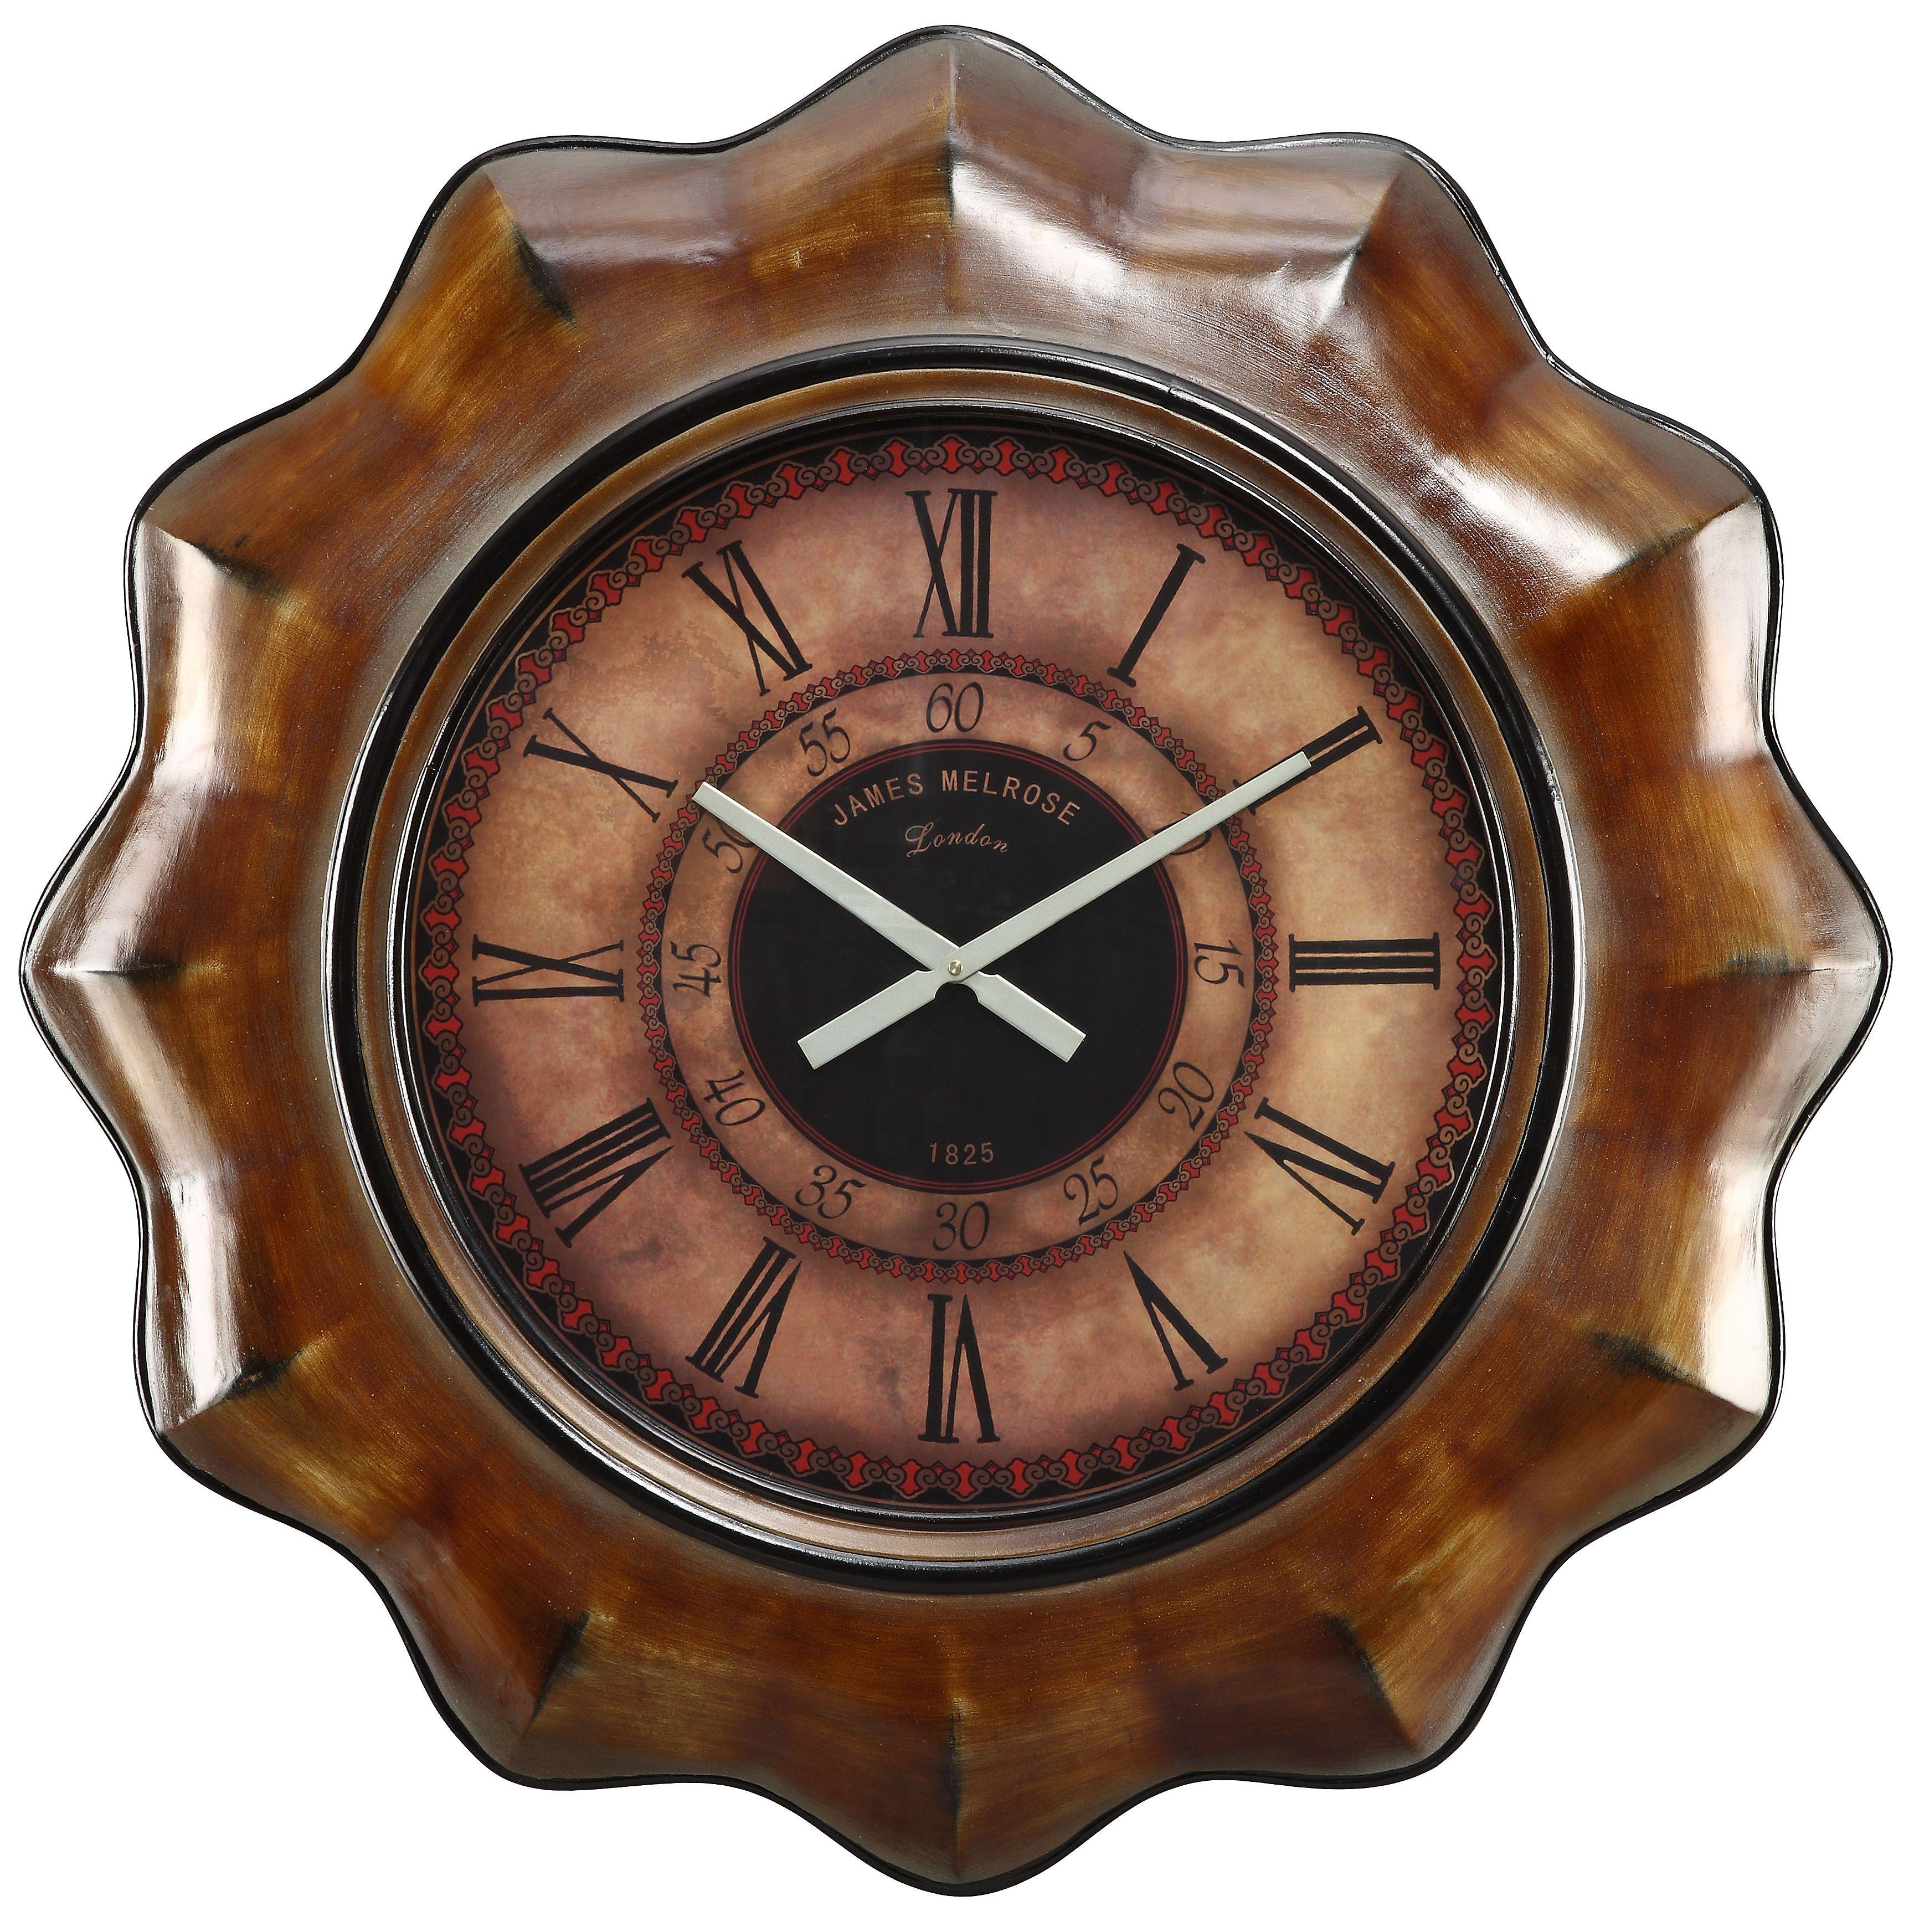 Cooper Classics Sullivan Clock 4965 In Stock Now Http Clocksmarketplace Com Products Cooper Classics Sul Wall Clock Oversized Wall Clock Large Wall Clock